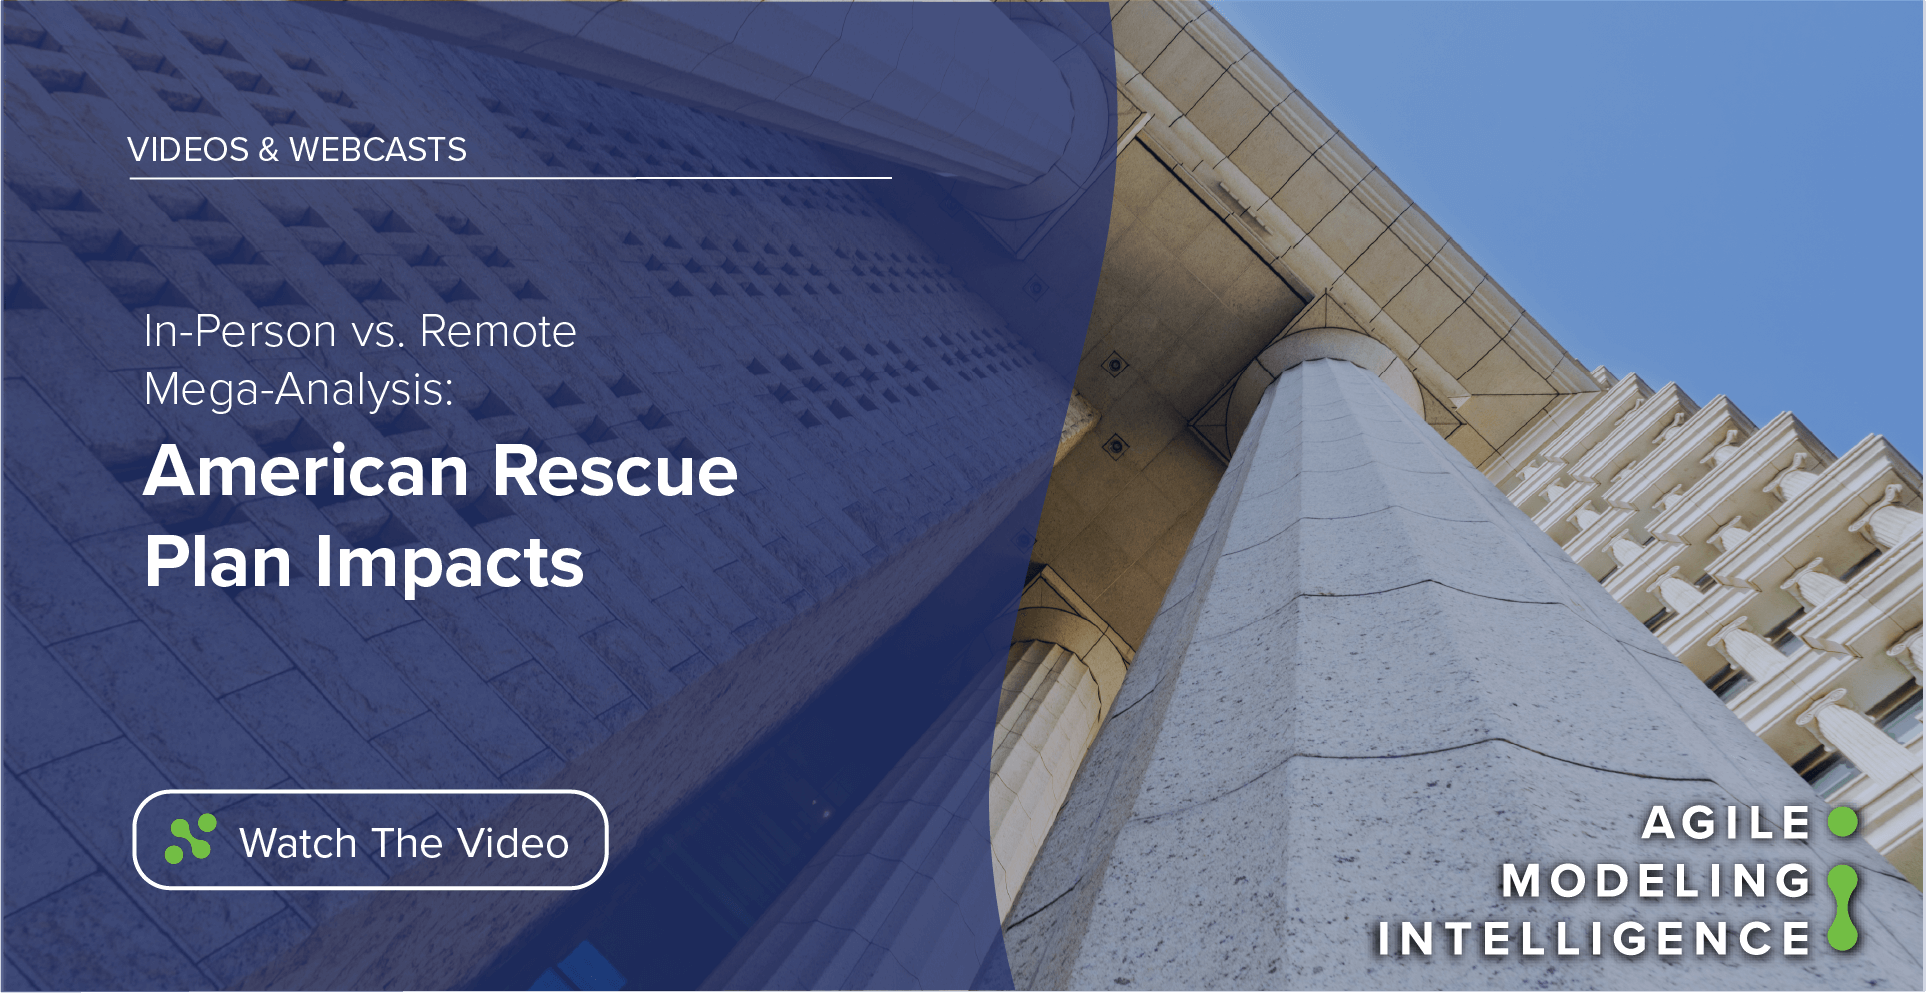 American Rescue Plan Impacts – In-Person vs. Remote Mega-Analysis